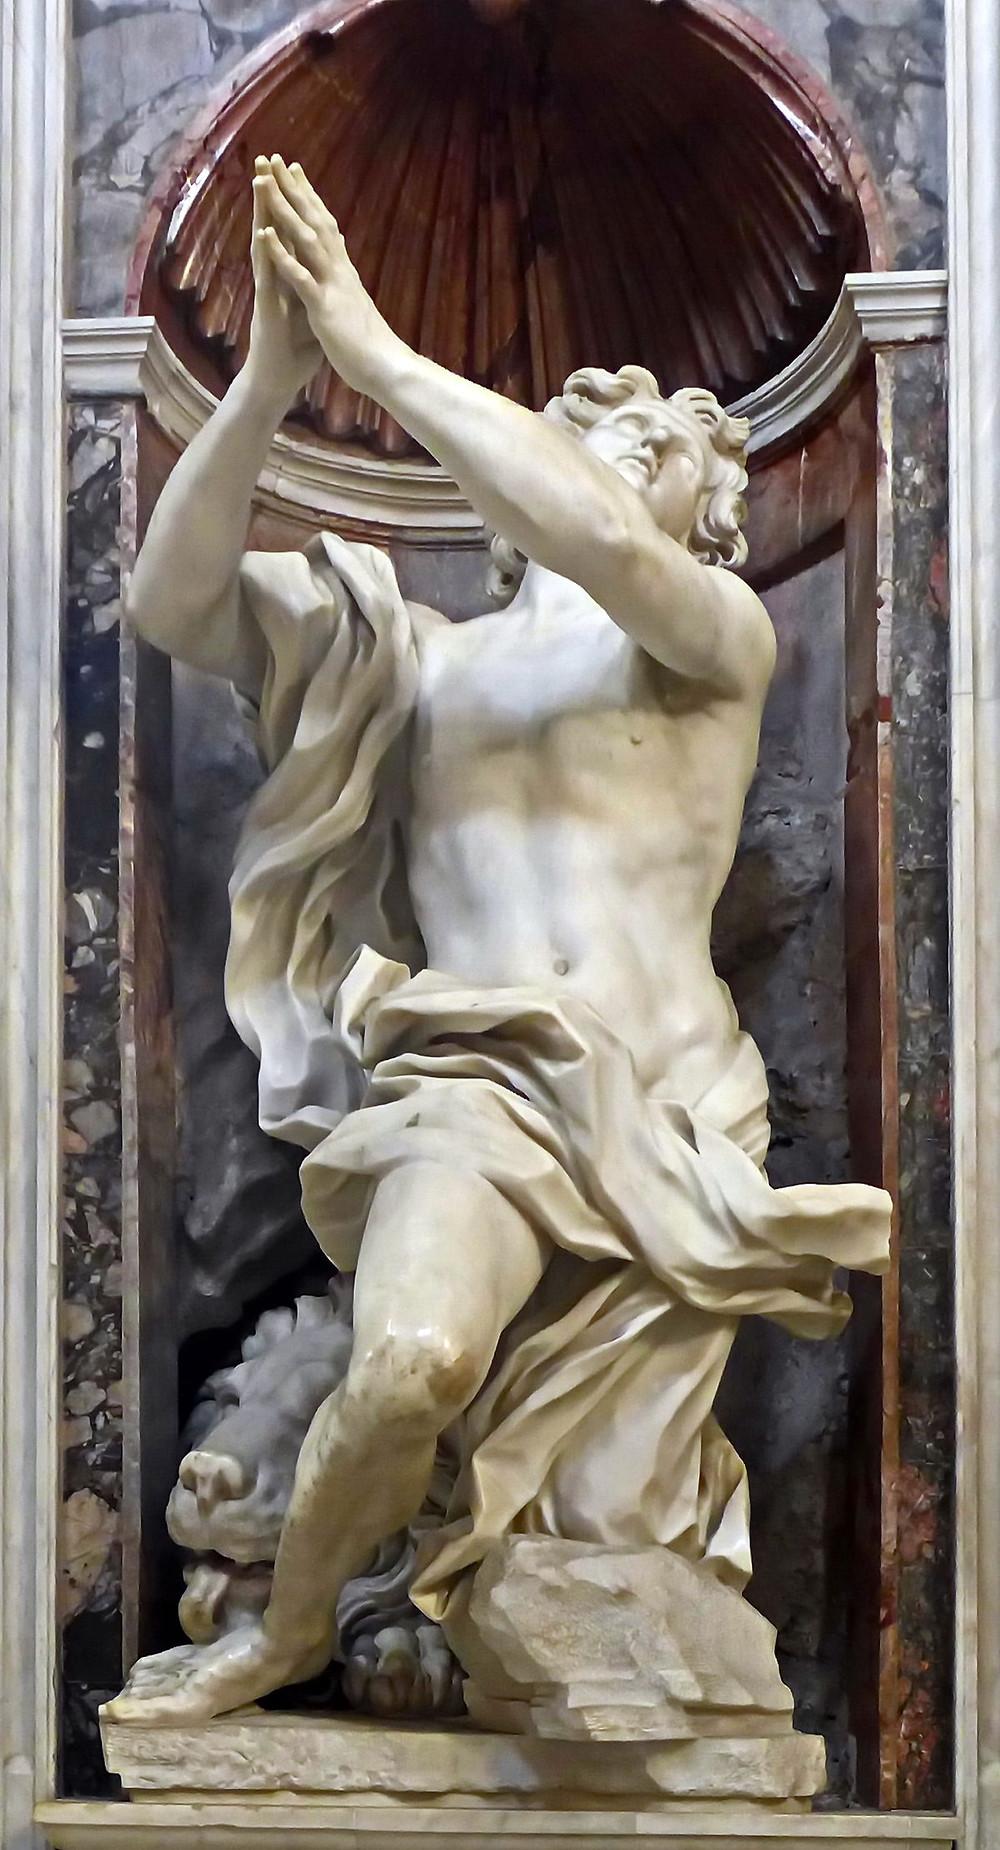 Bernini's Daniel sculpture in the Chigi Chapel